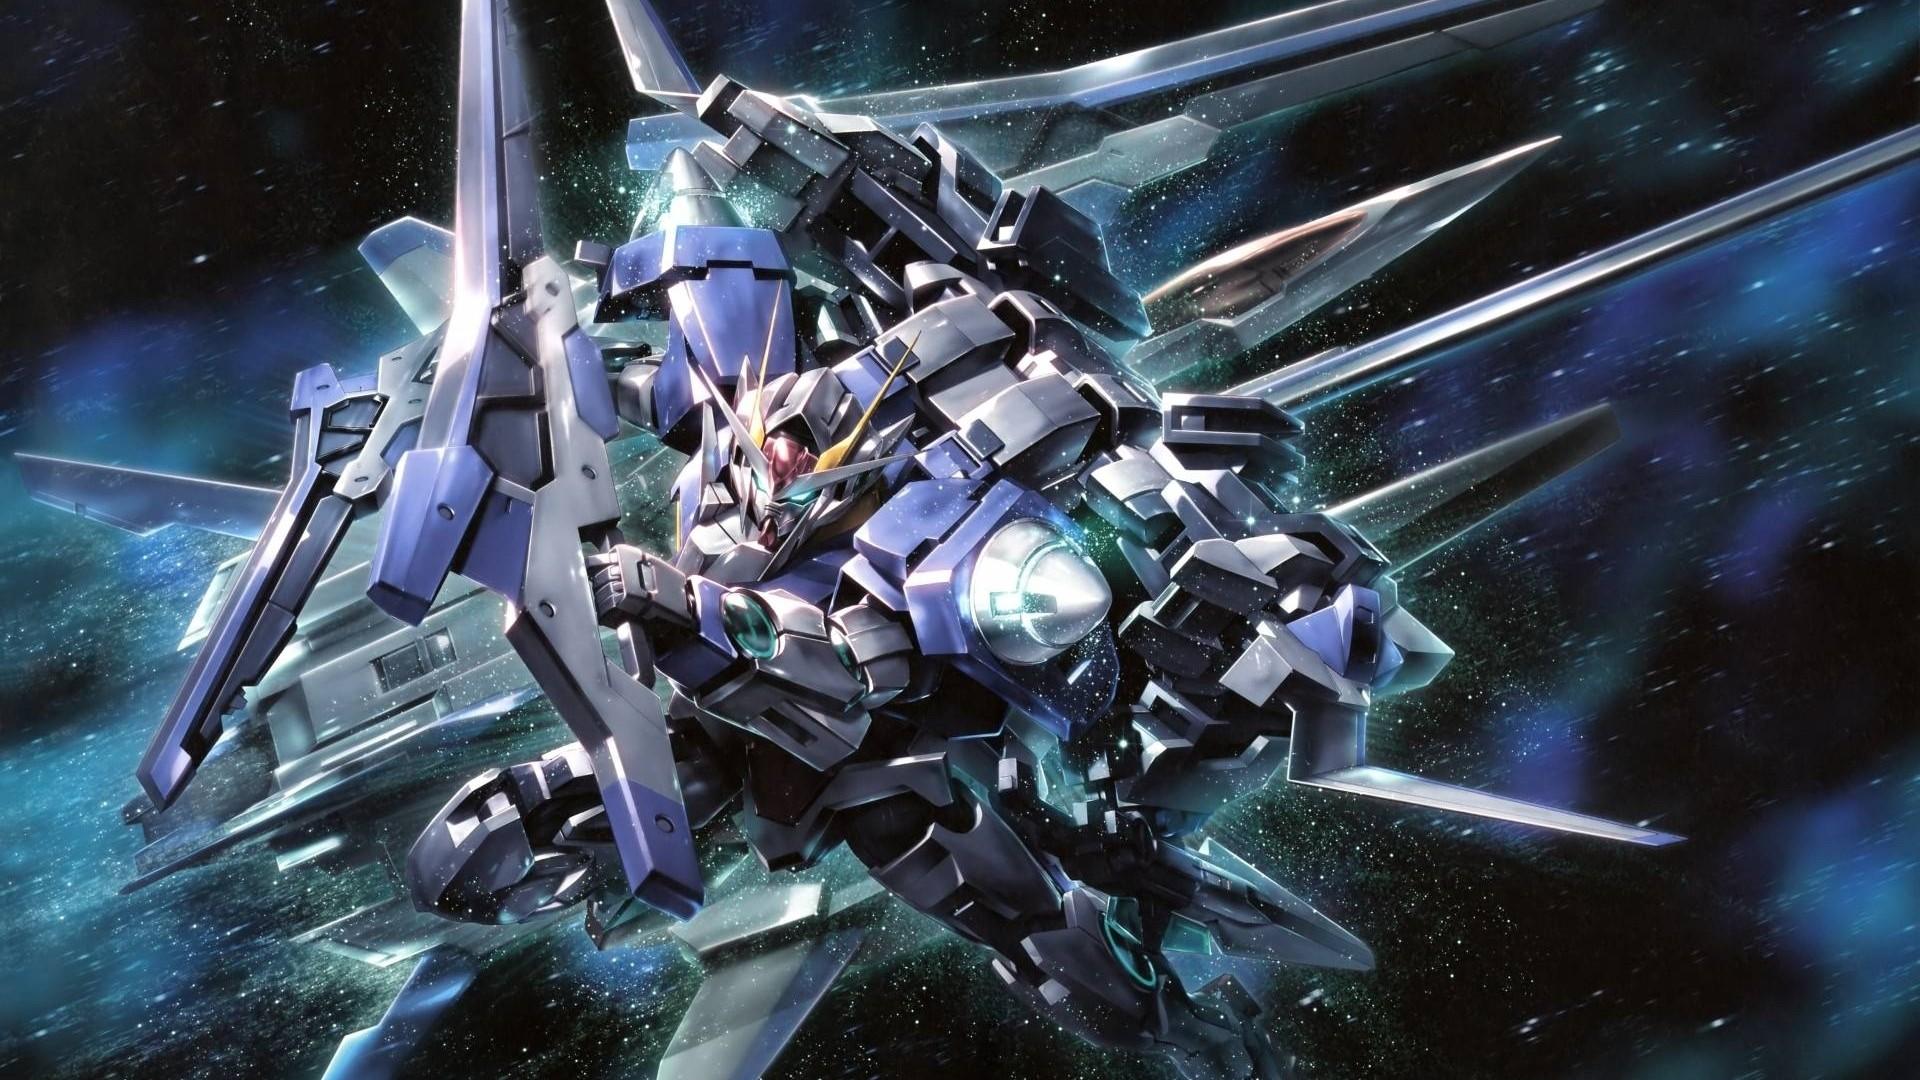 Gundam Wallpaper Image